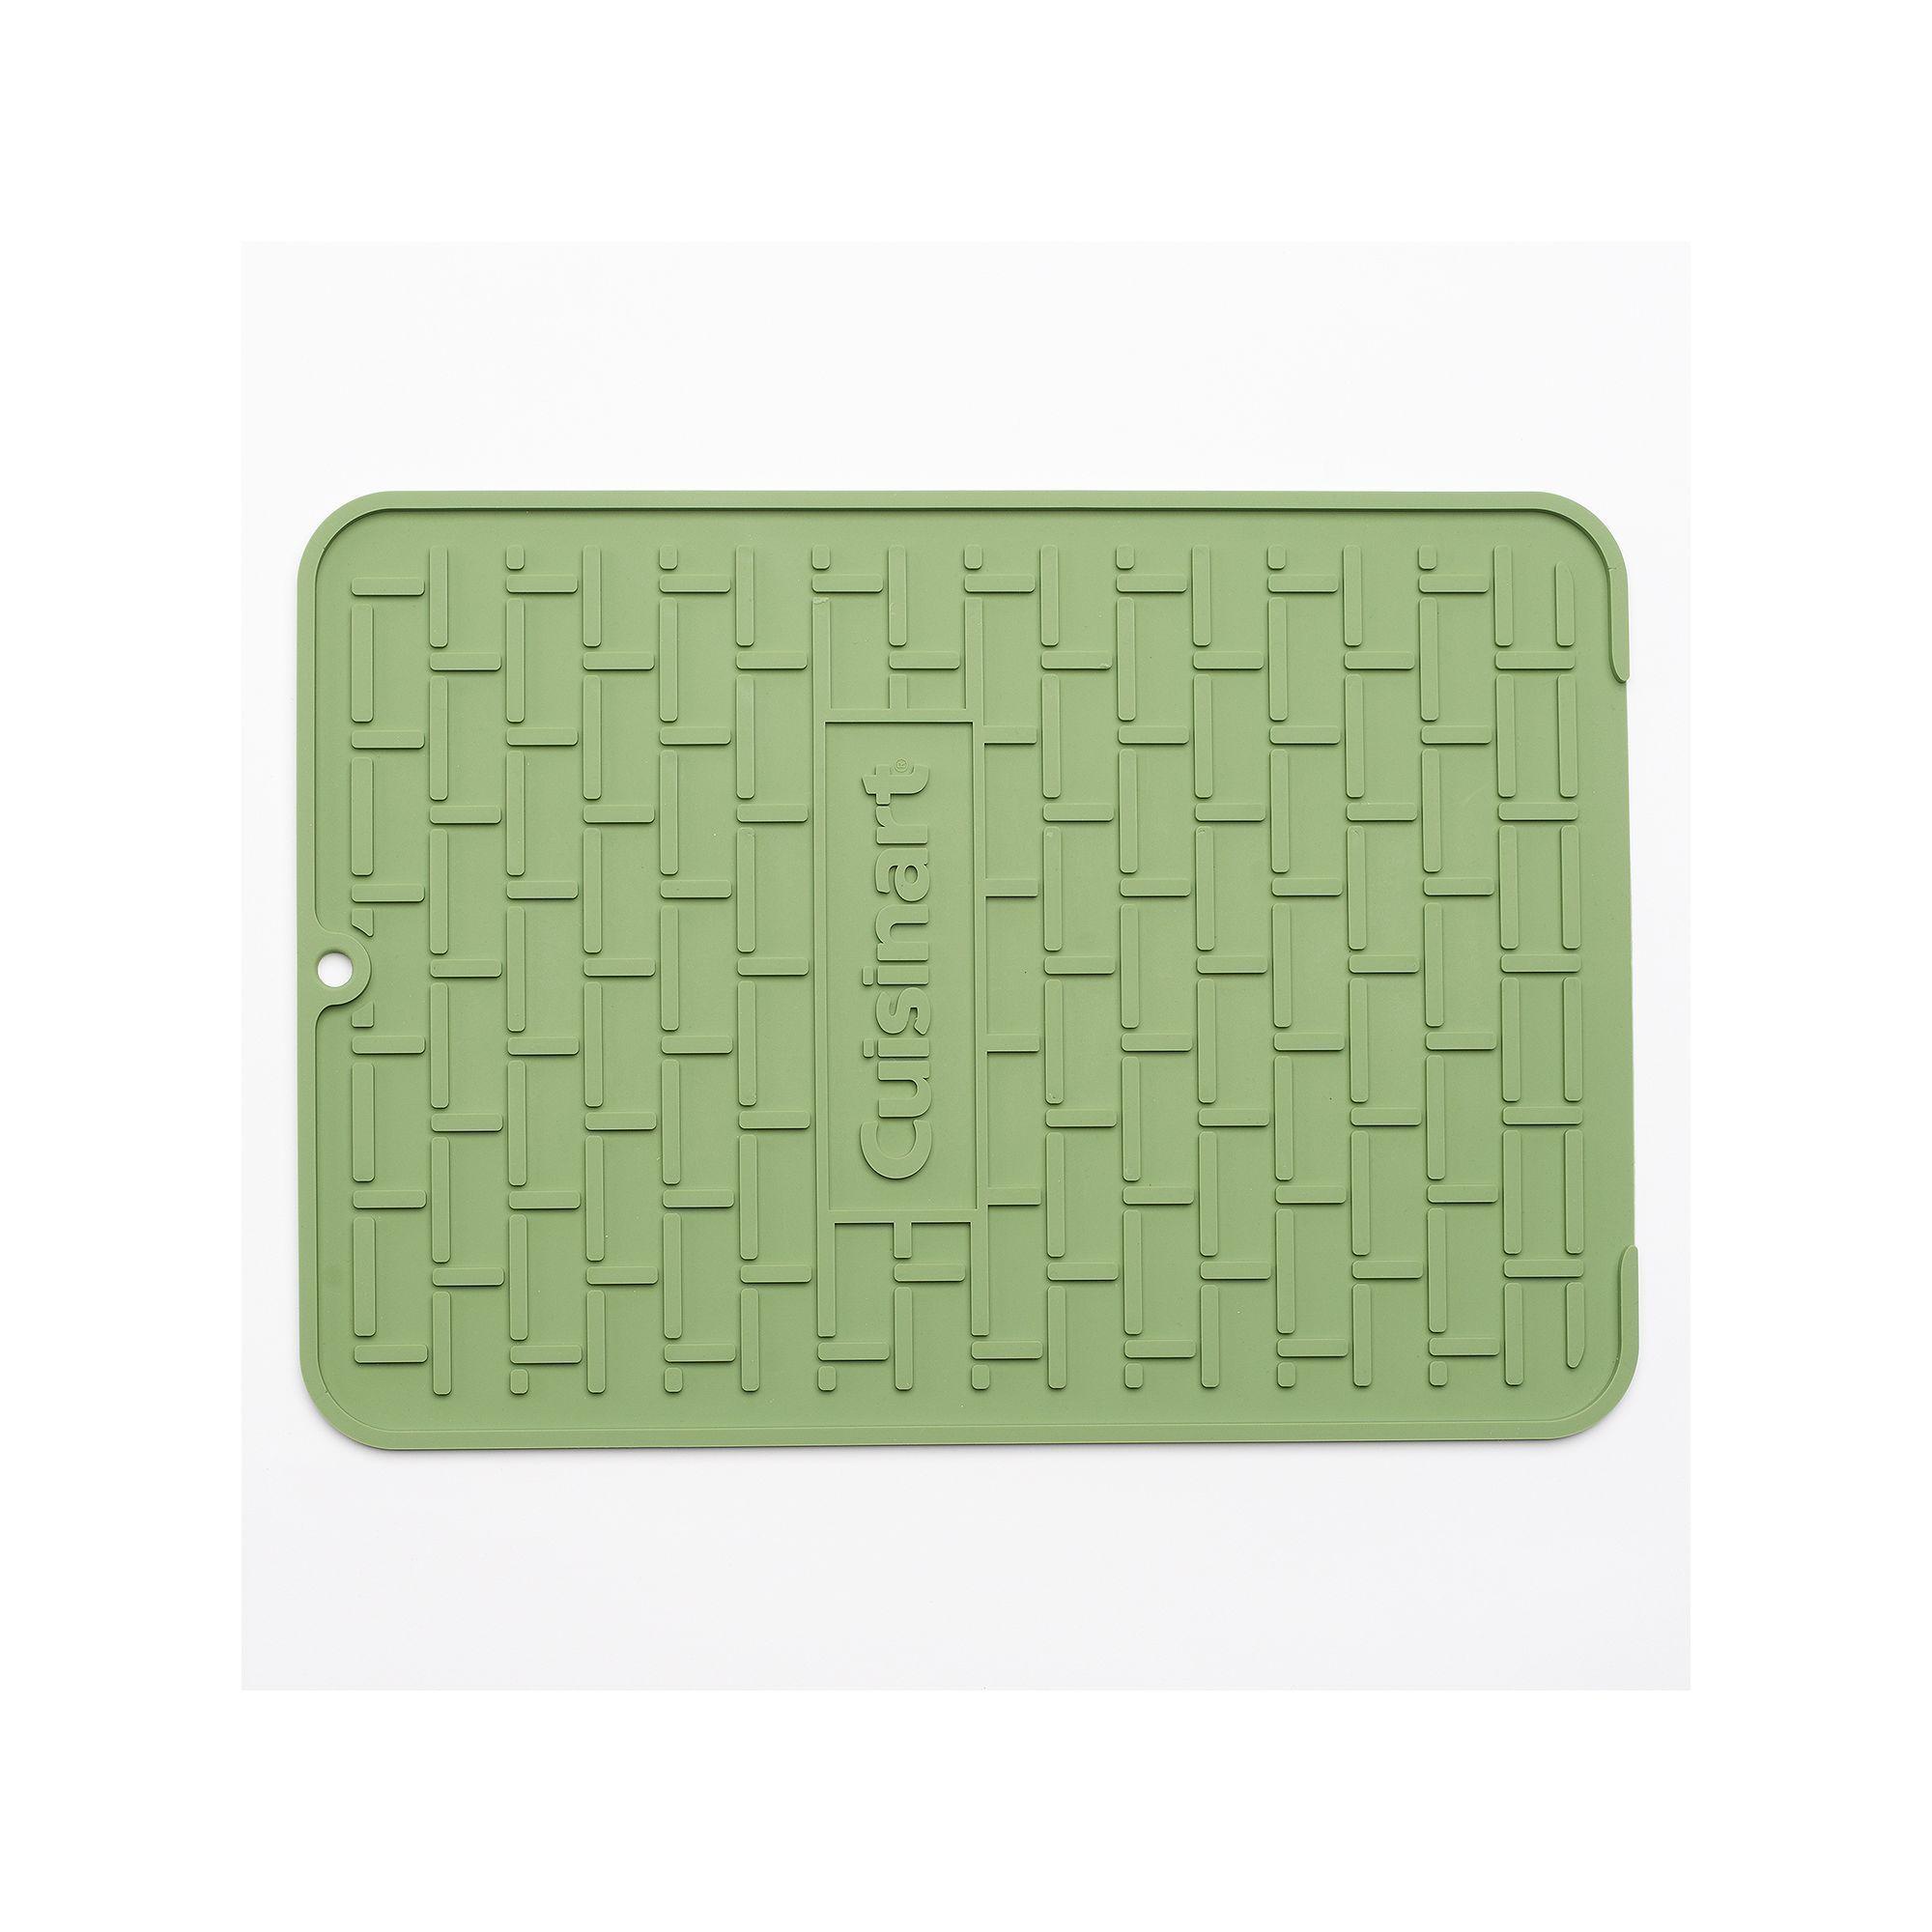 Cuisinart Silicone Dish Drying Mat In 2020 Dish Drying Mat